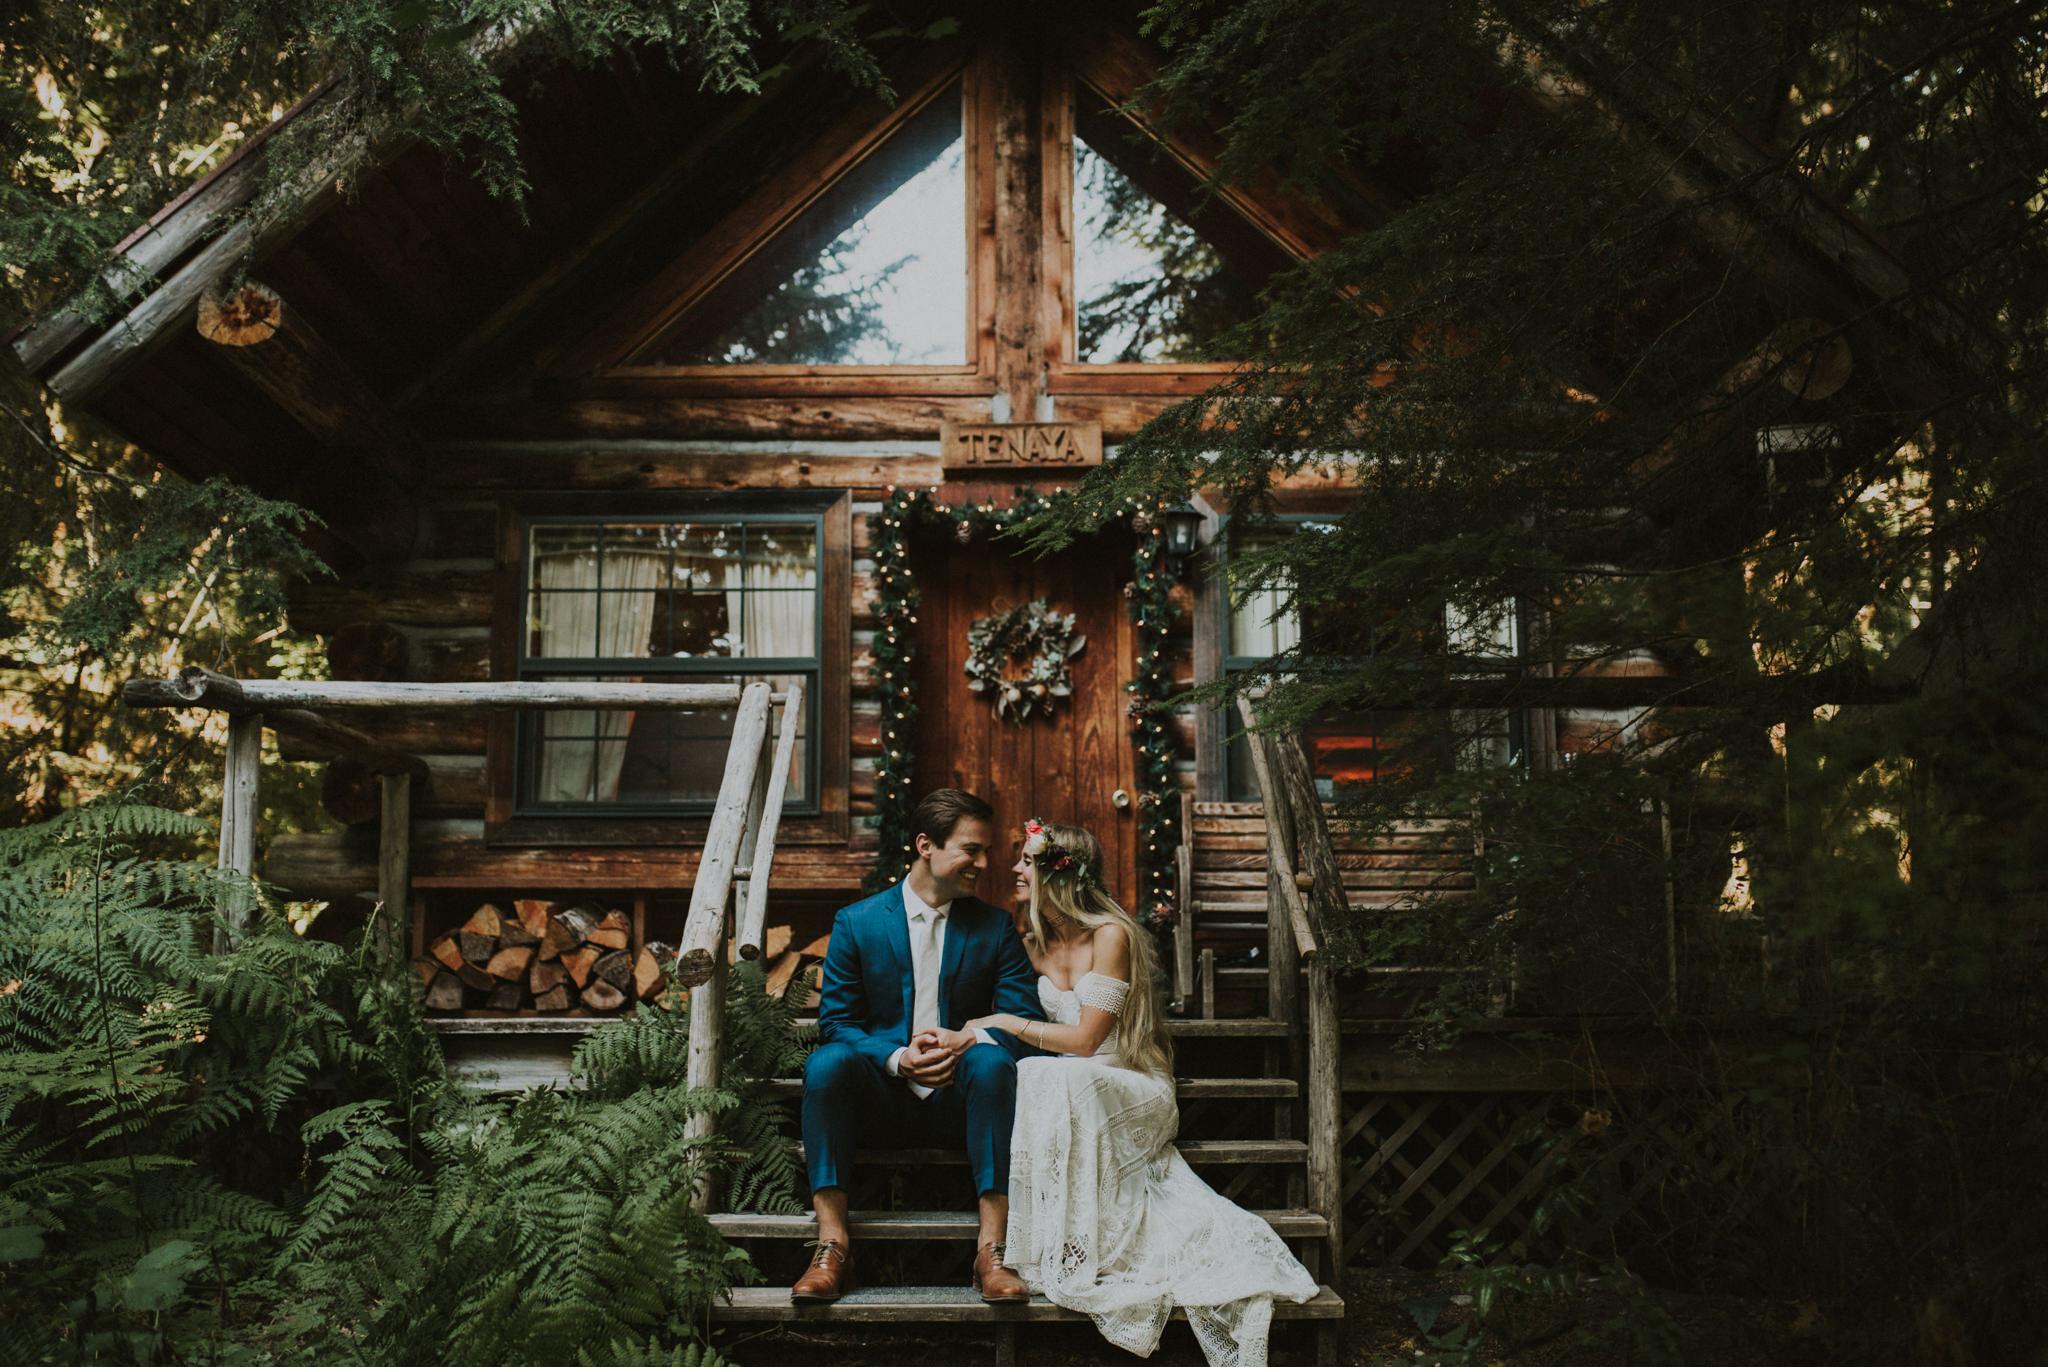 Laurel + Benton - Washington